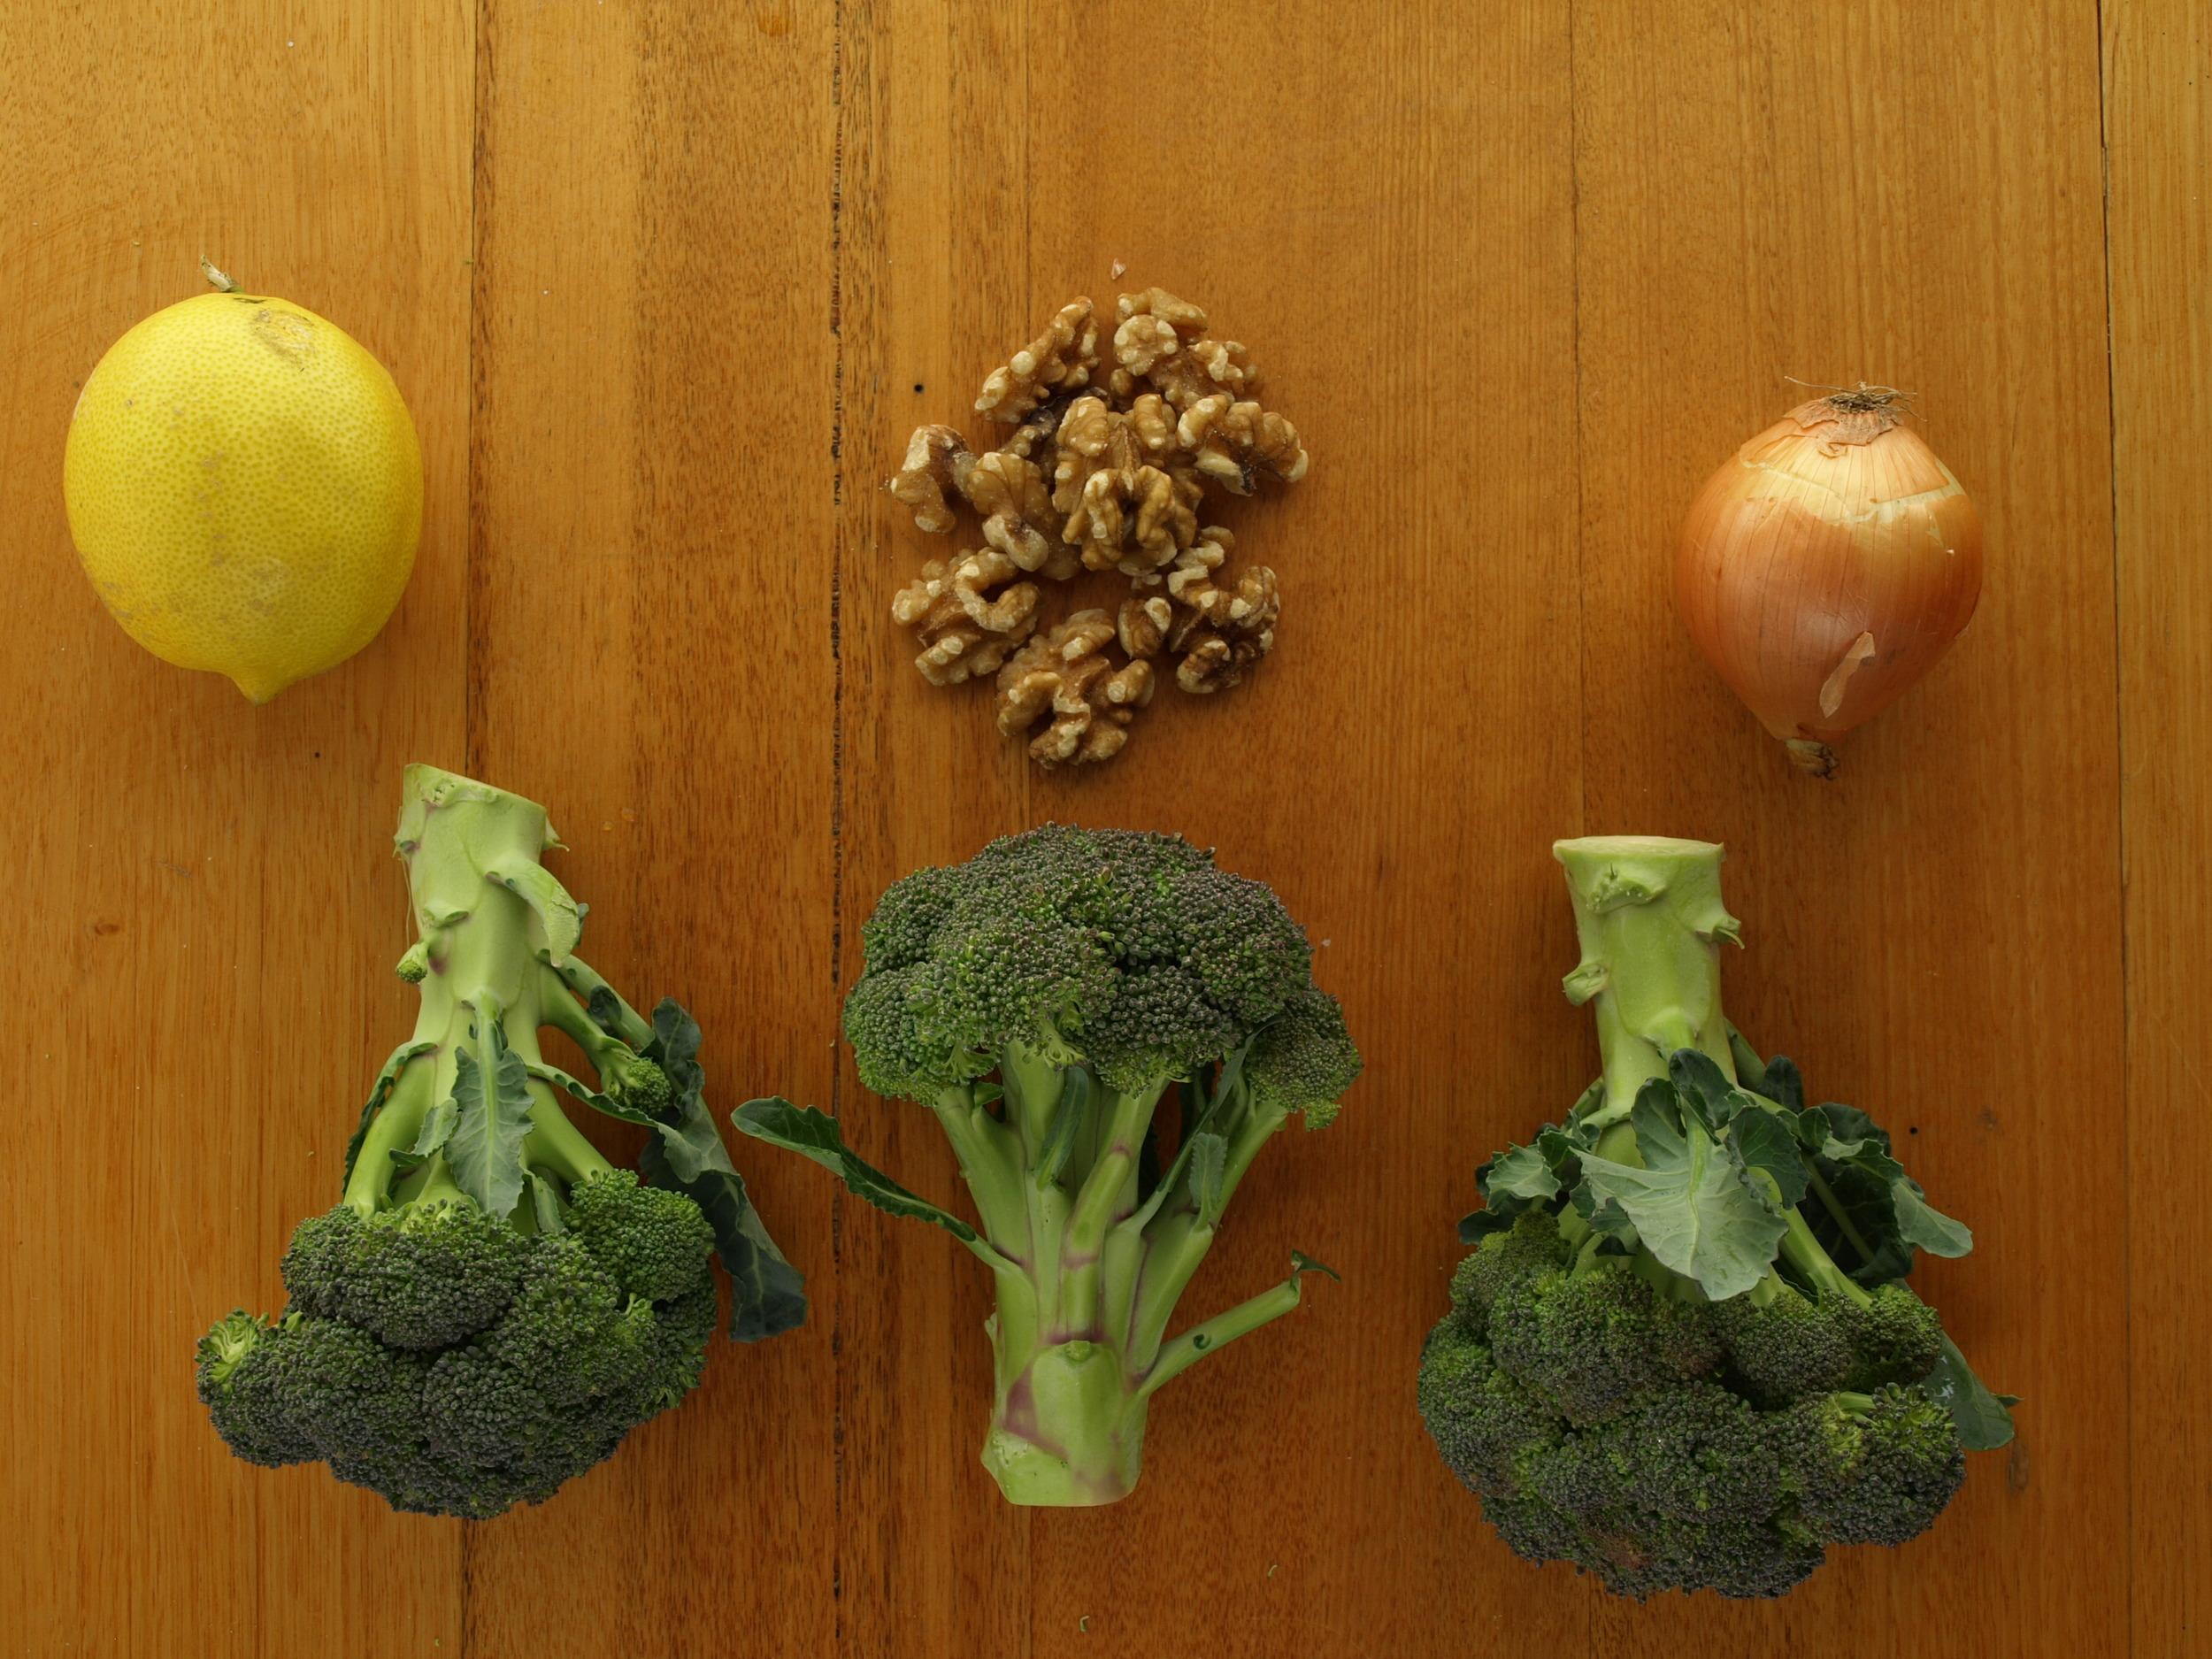 Steamed Broccoli with Walnut Dressing Ingredients